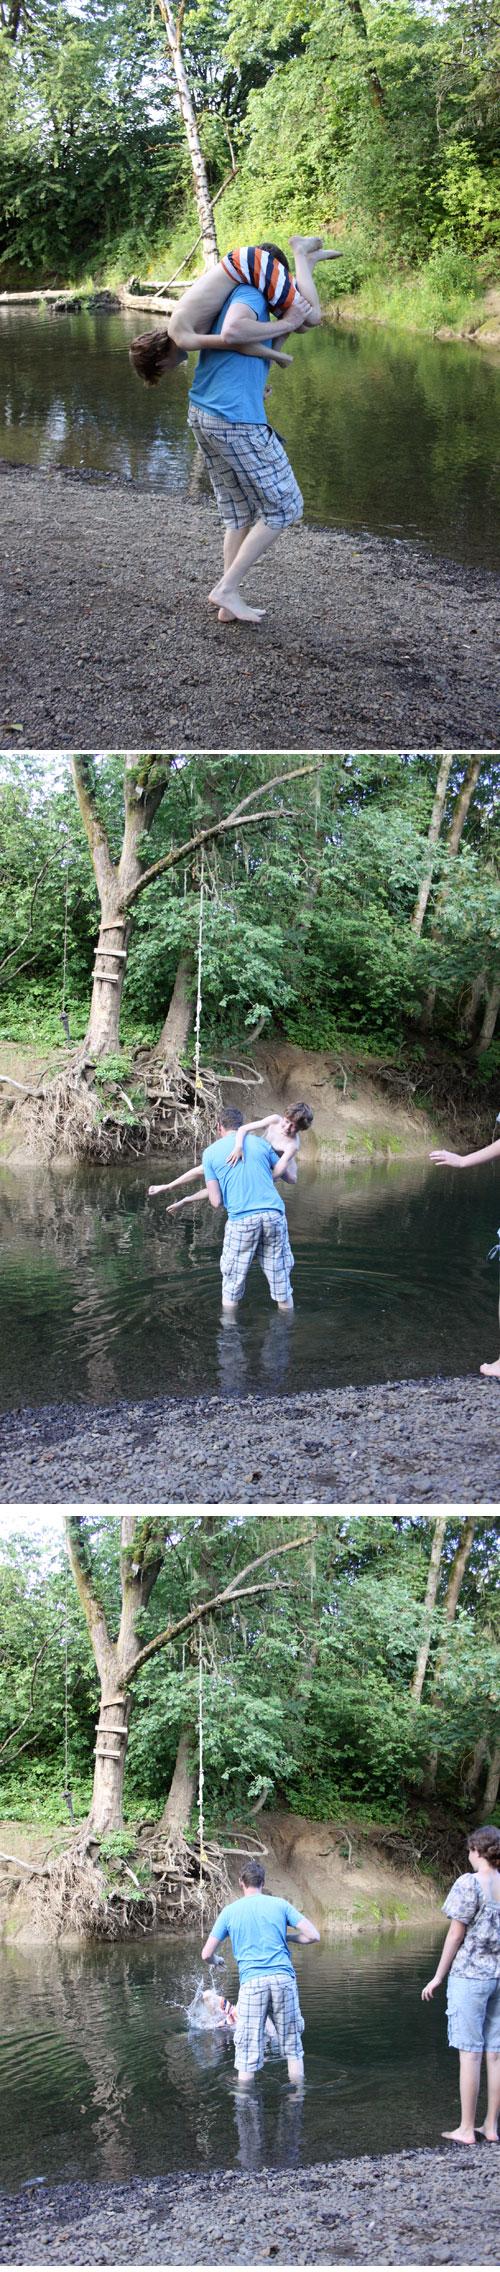 Creekdump